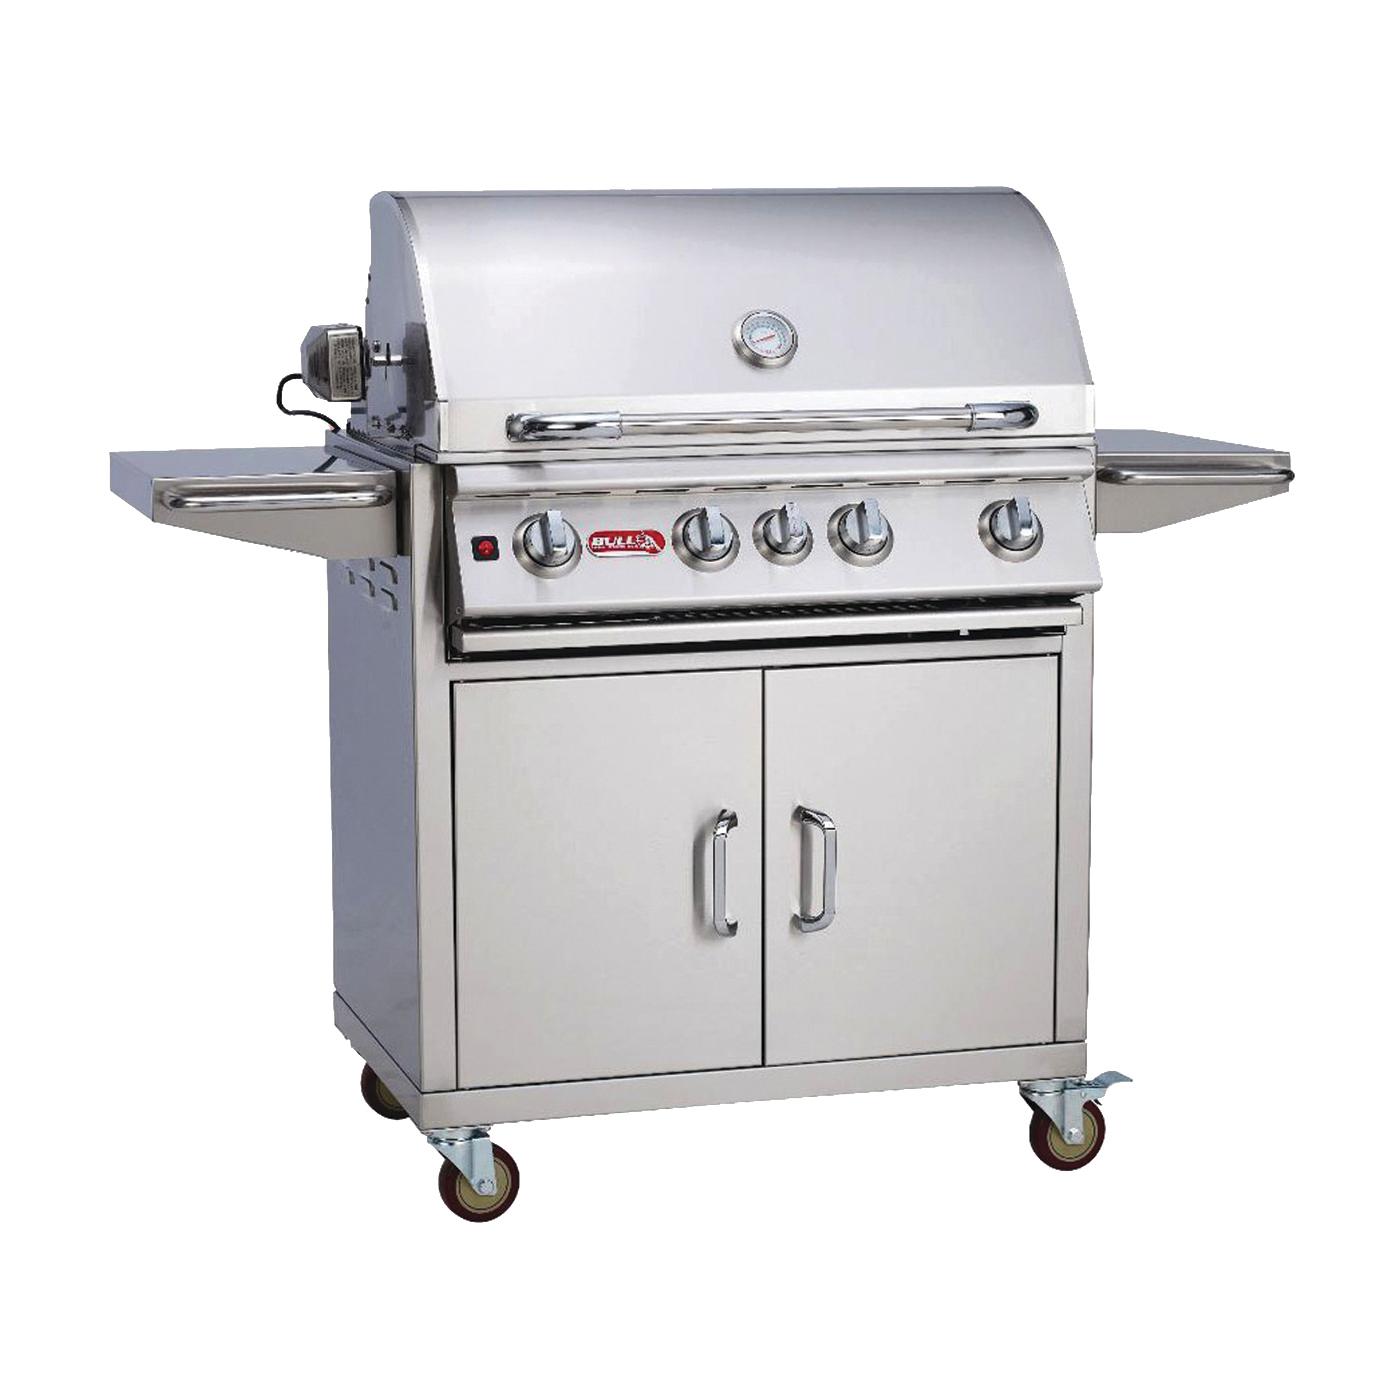 Picture of BULL 45550 Gas Grill Cart Bottom, 48-5/8 in OAL, 56-1/2 in OAW, 25 in OAH, Stainless Steel